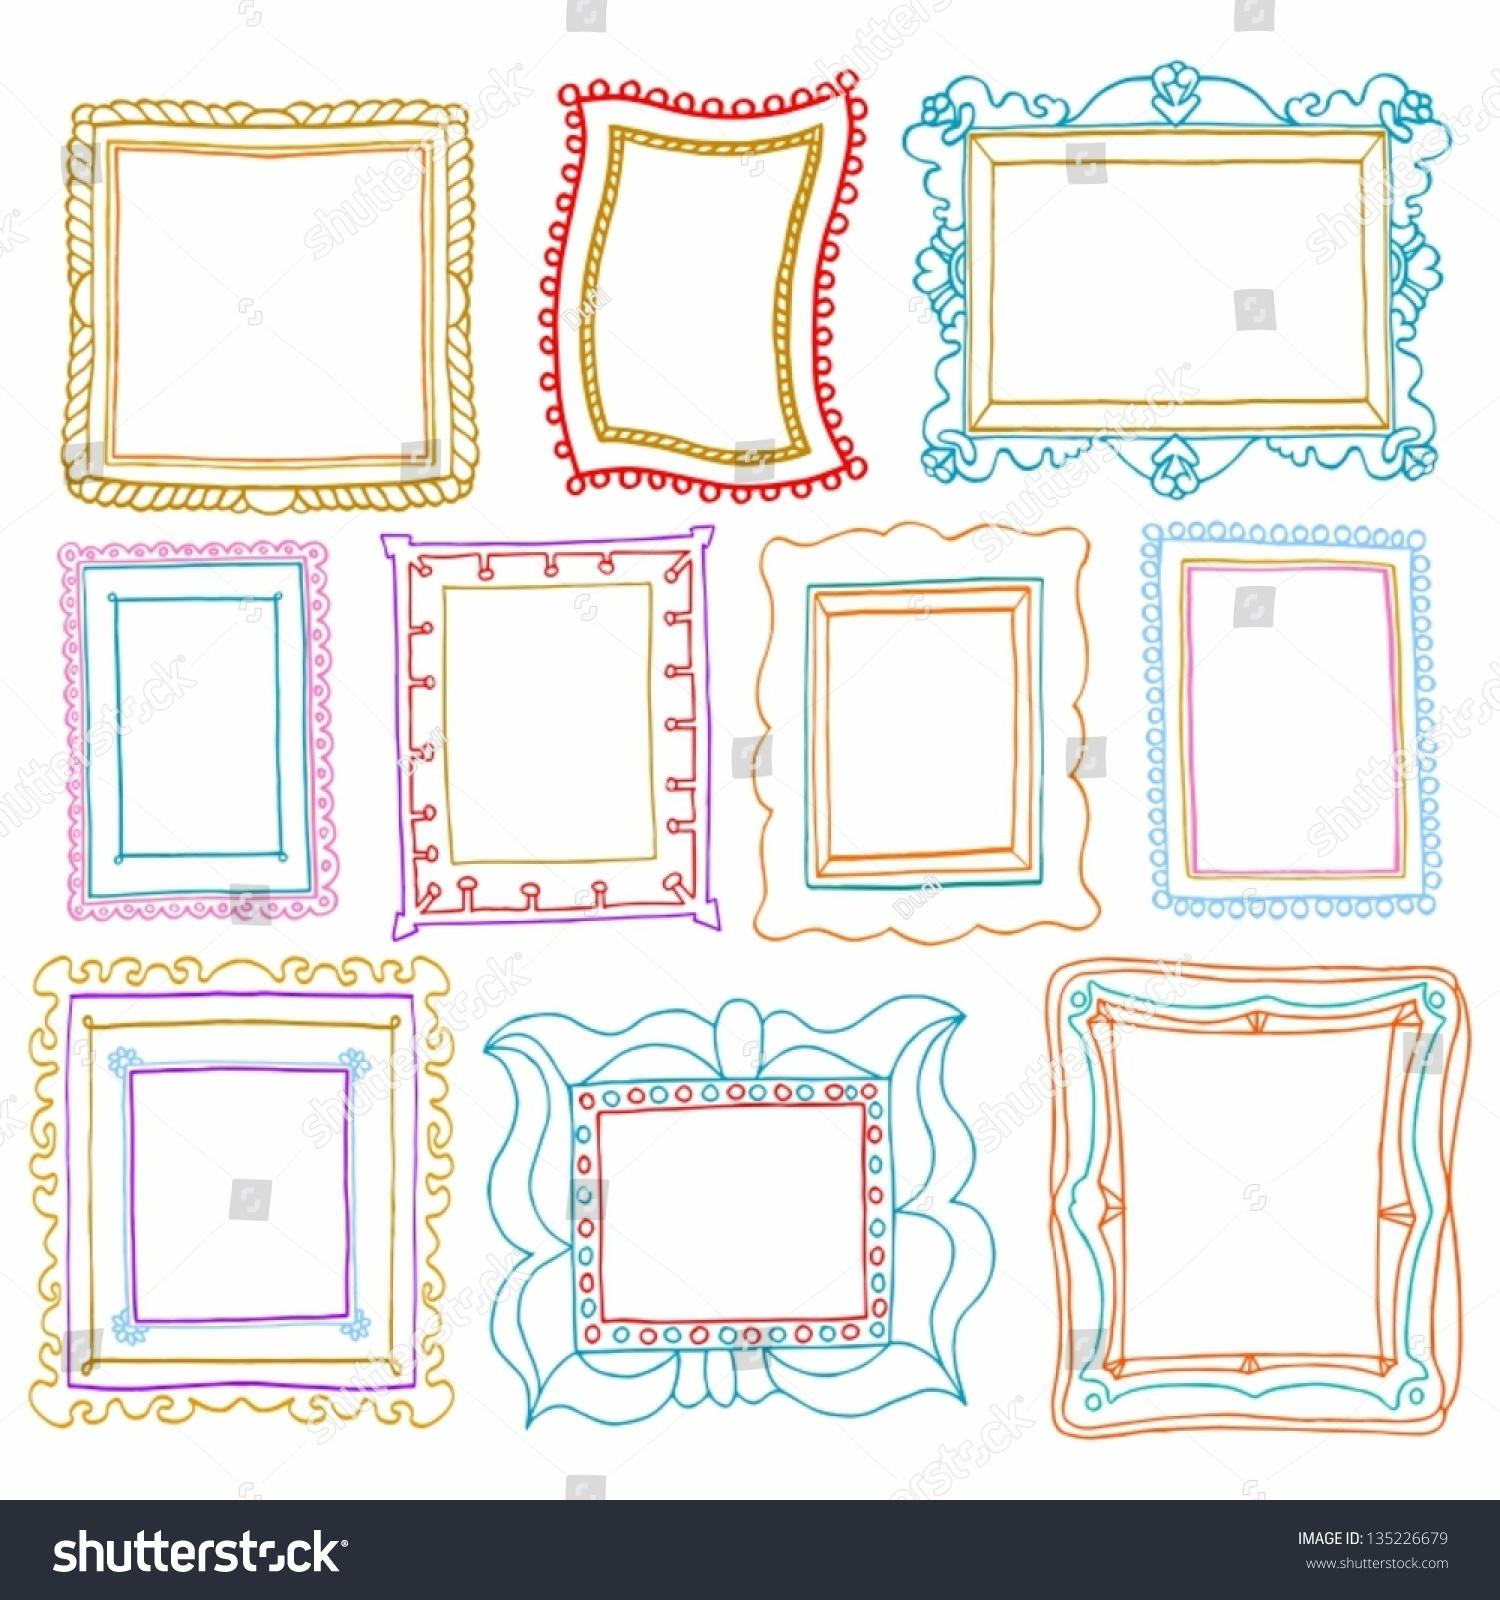 Vintage Photo Frames Set Drawing Doodle Stock Vector HD (Royalty ...